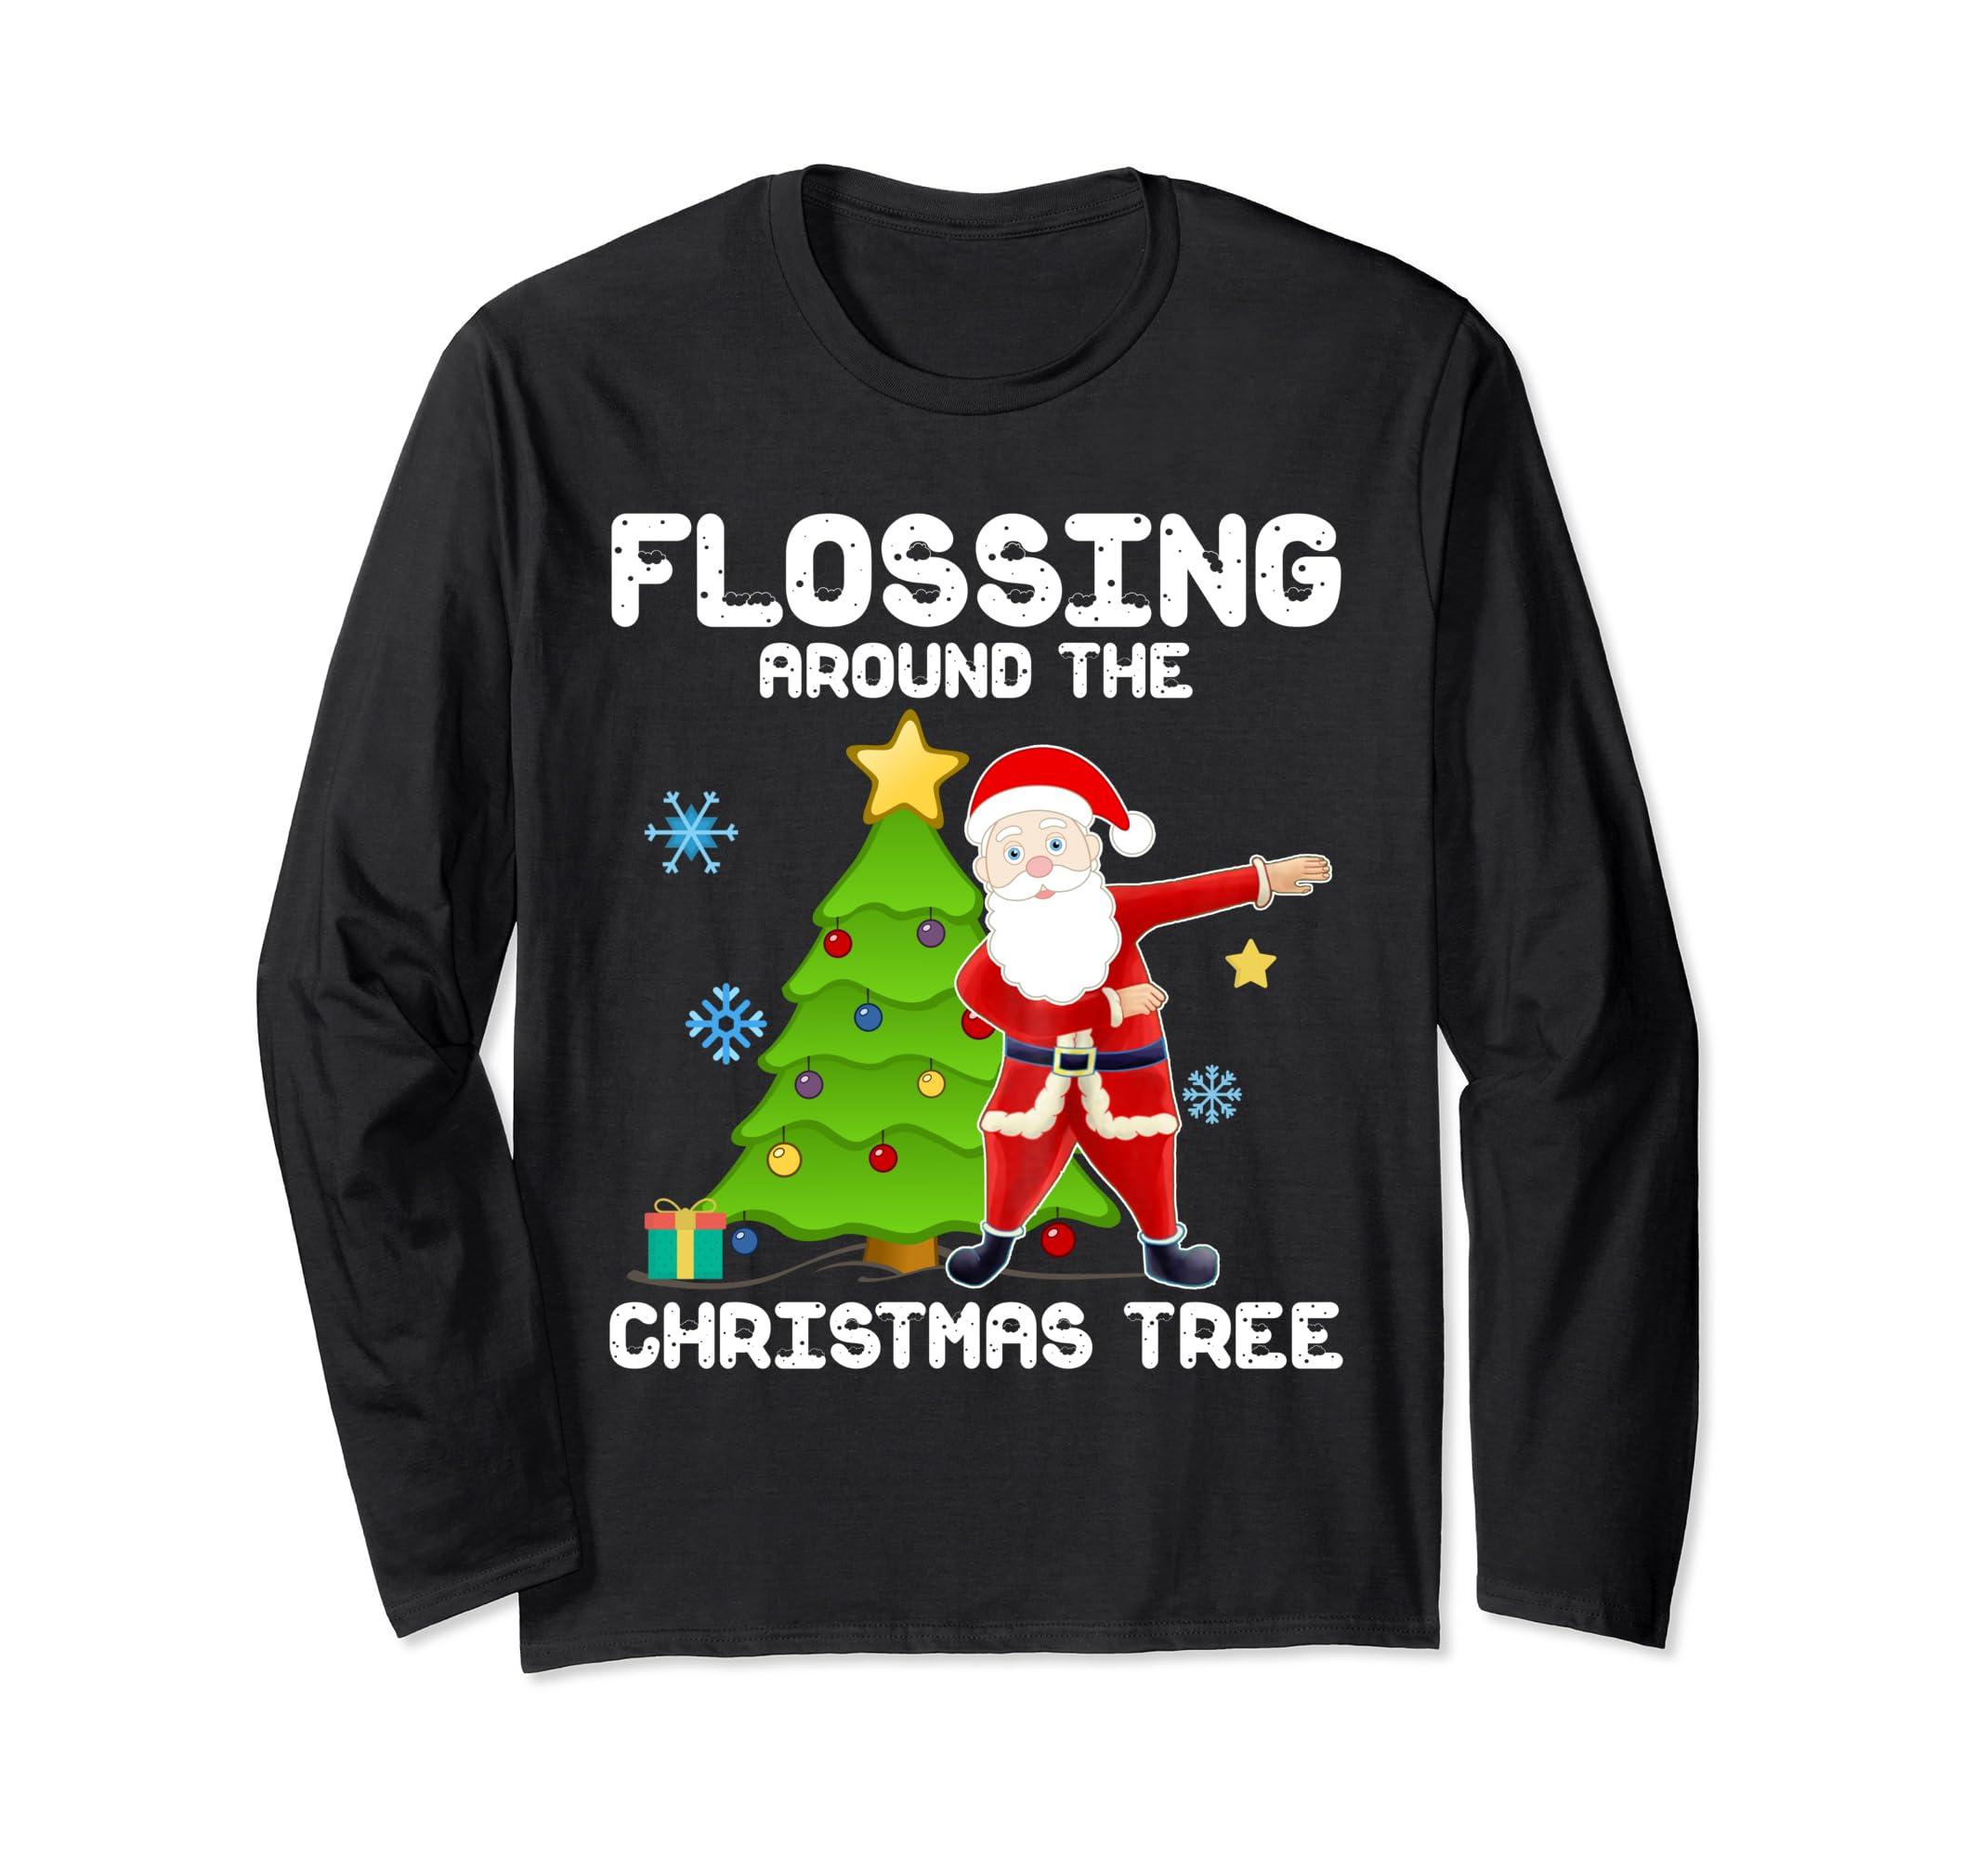 813bb1ce5 Amazon.com: Santa Flossing around the Christmas Tree Long Sleeve T-Shirt:  Clothing